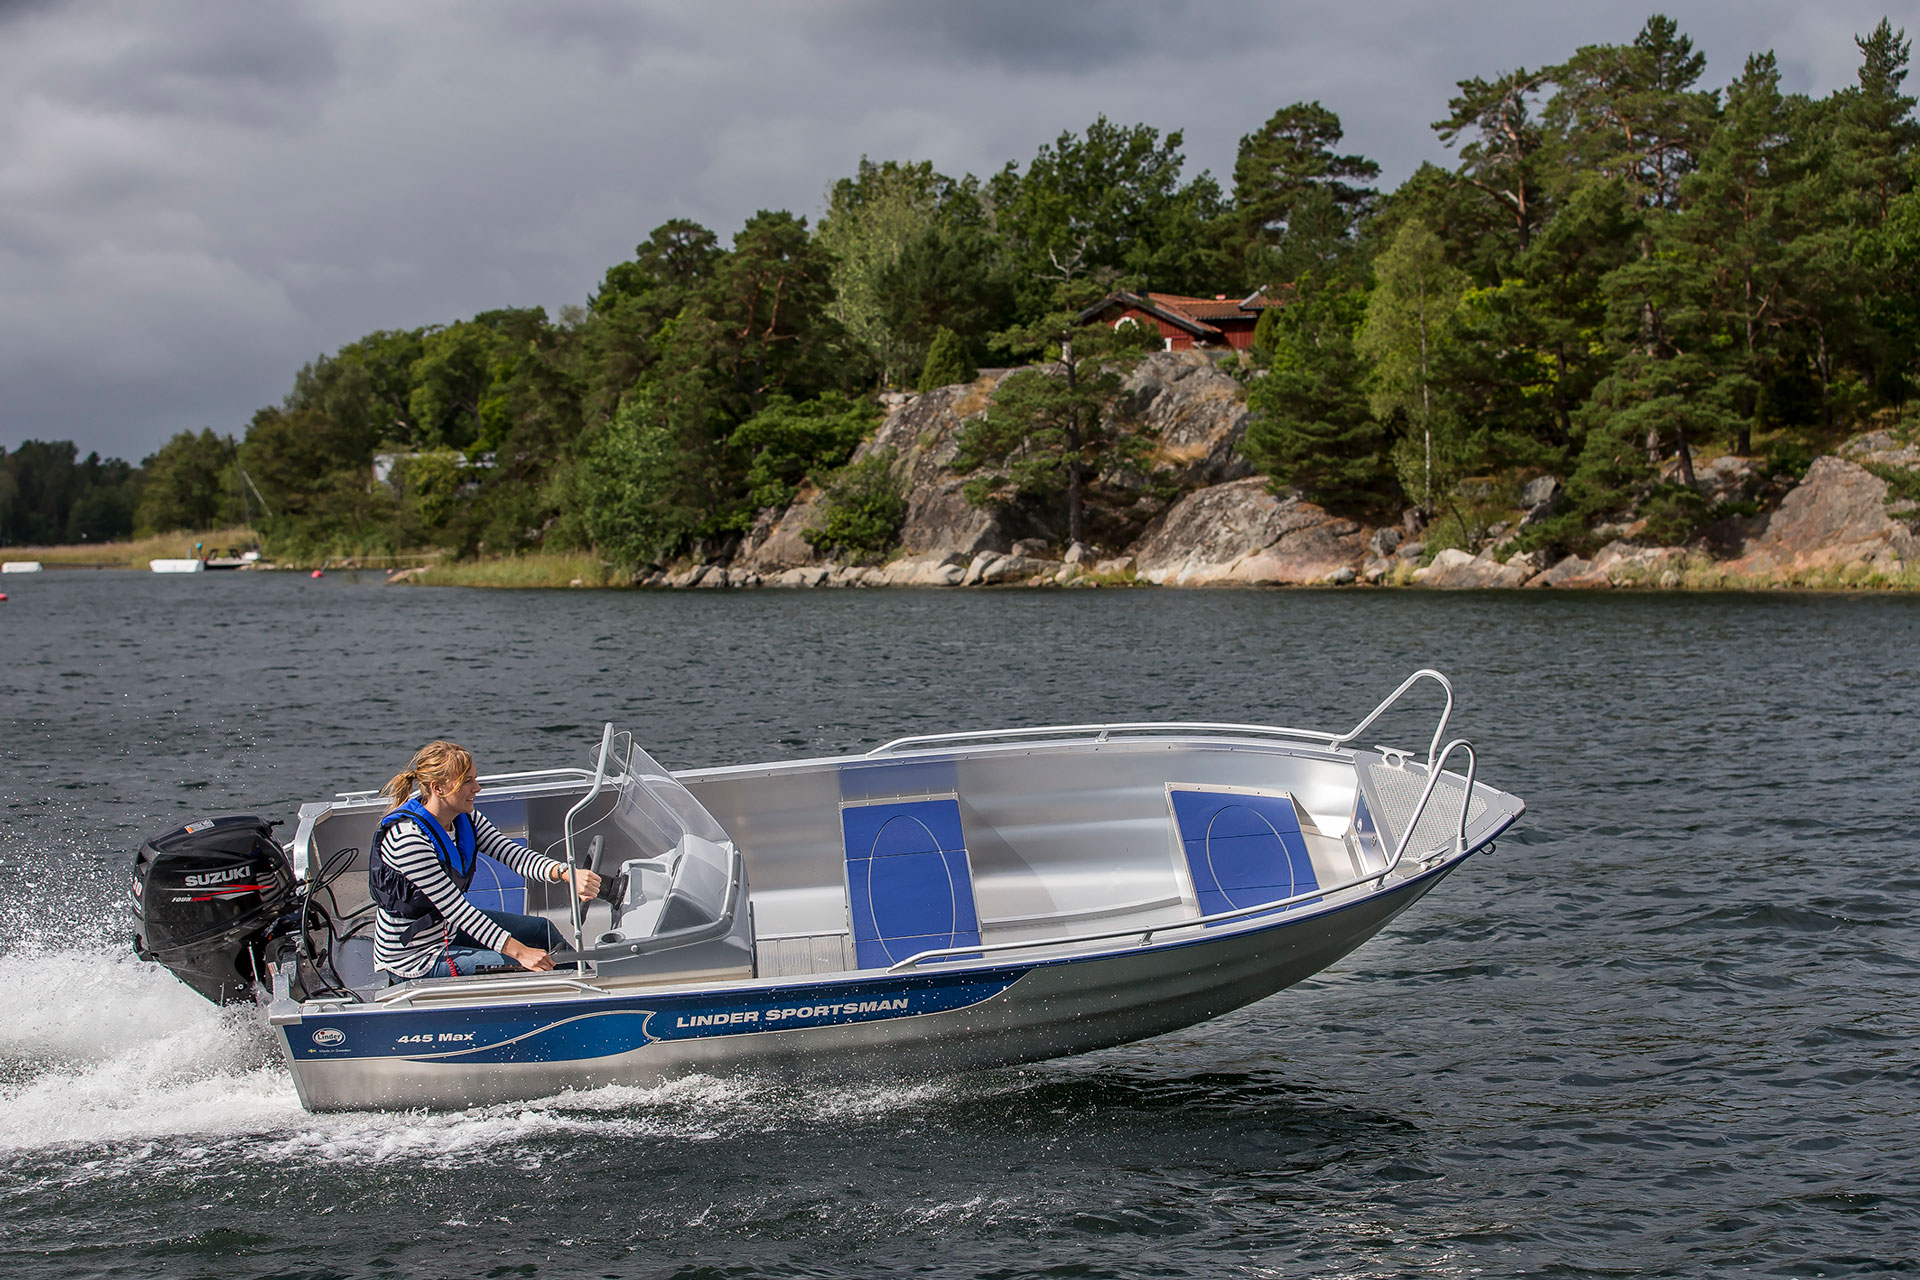 sportsman445max-båt